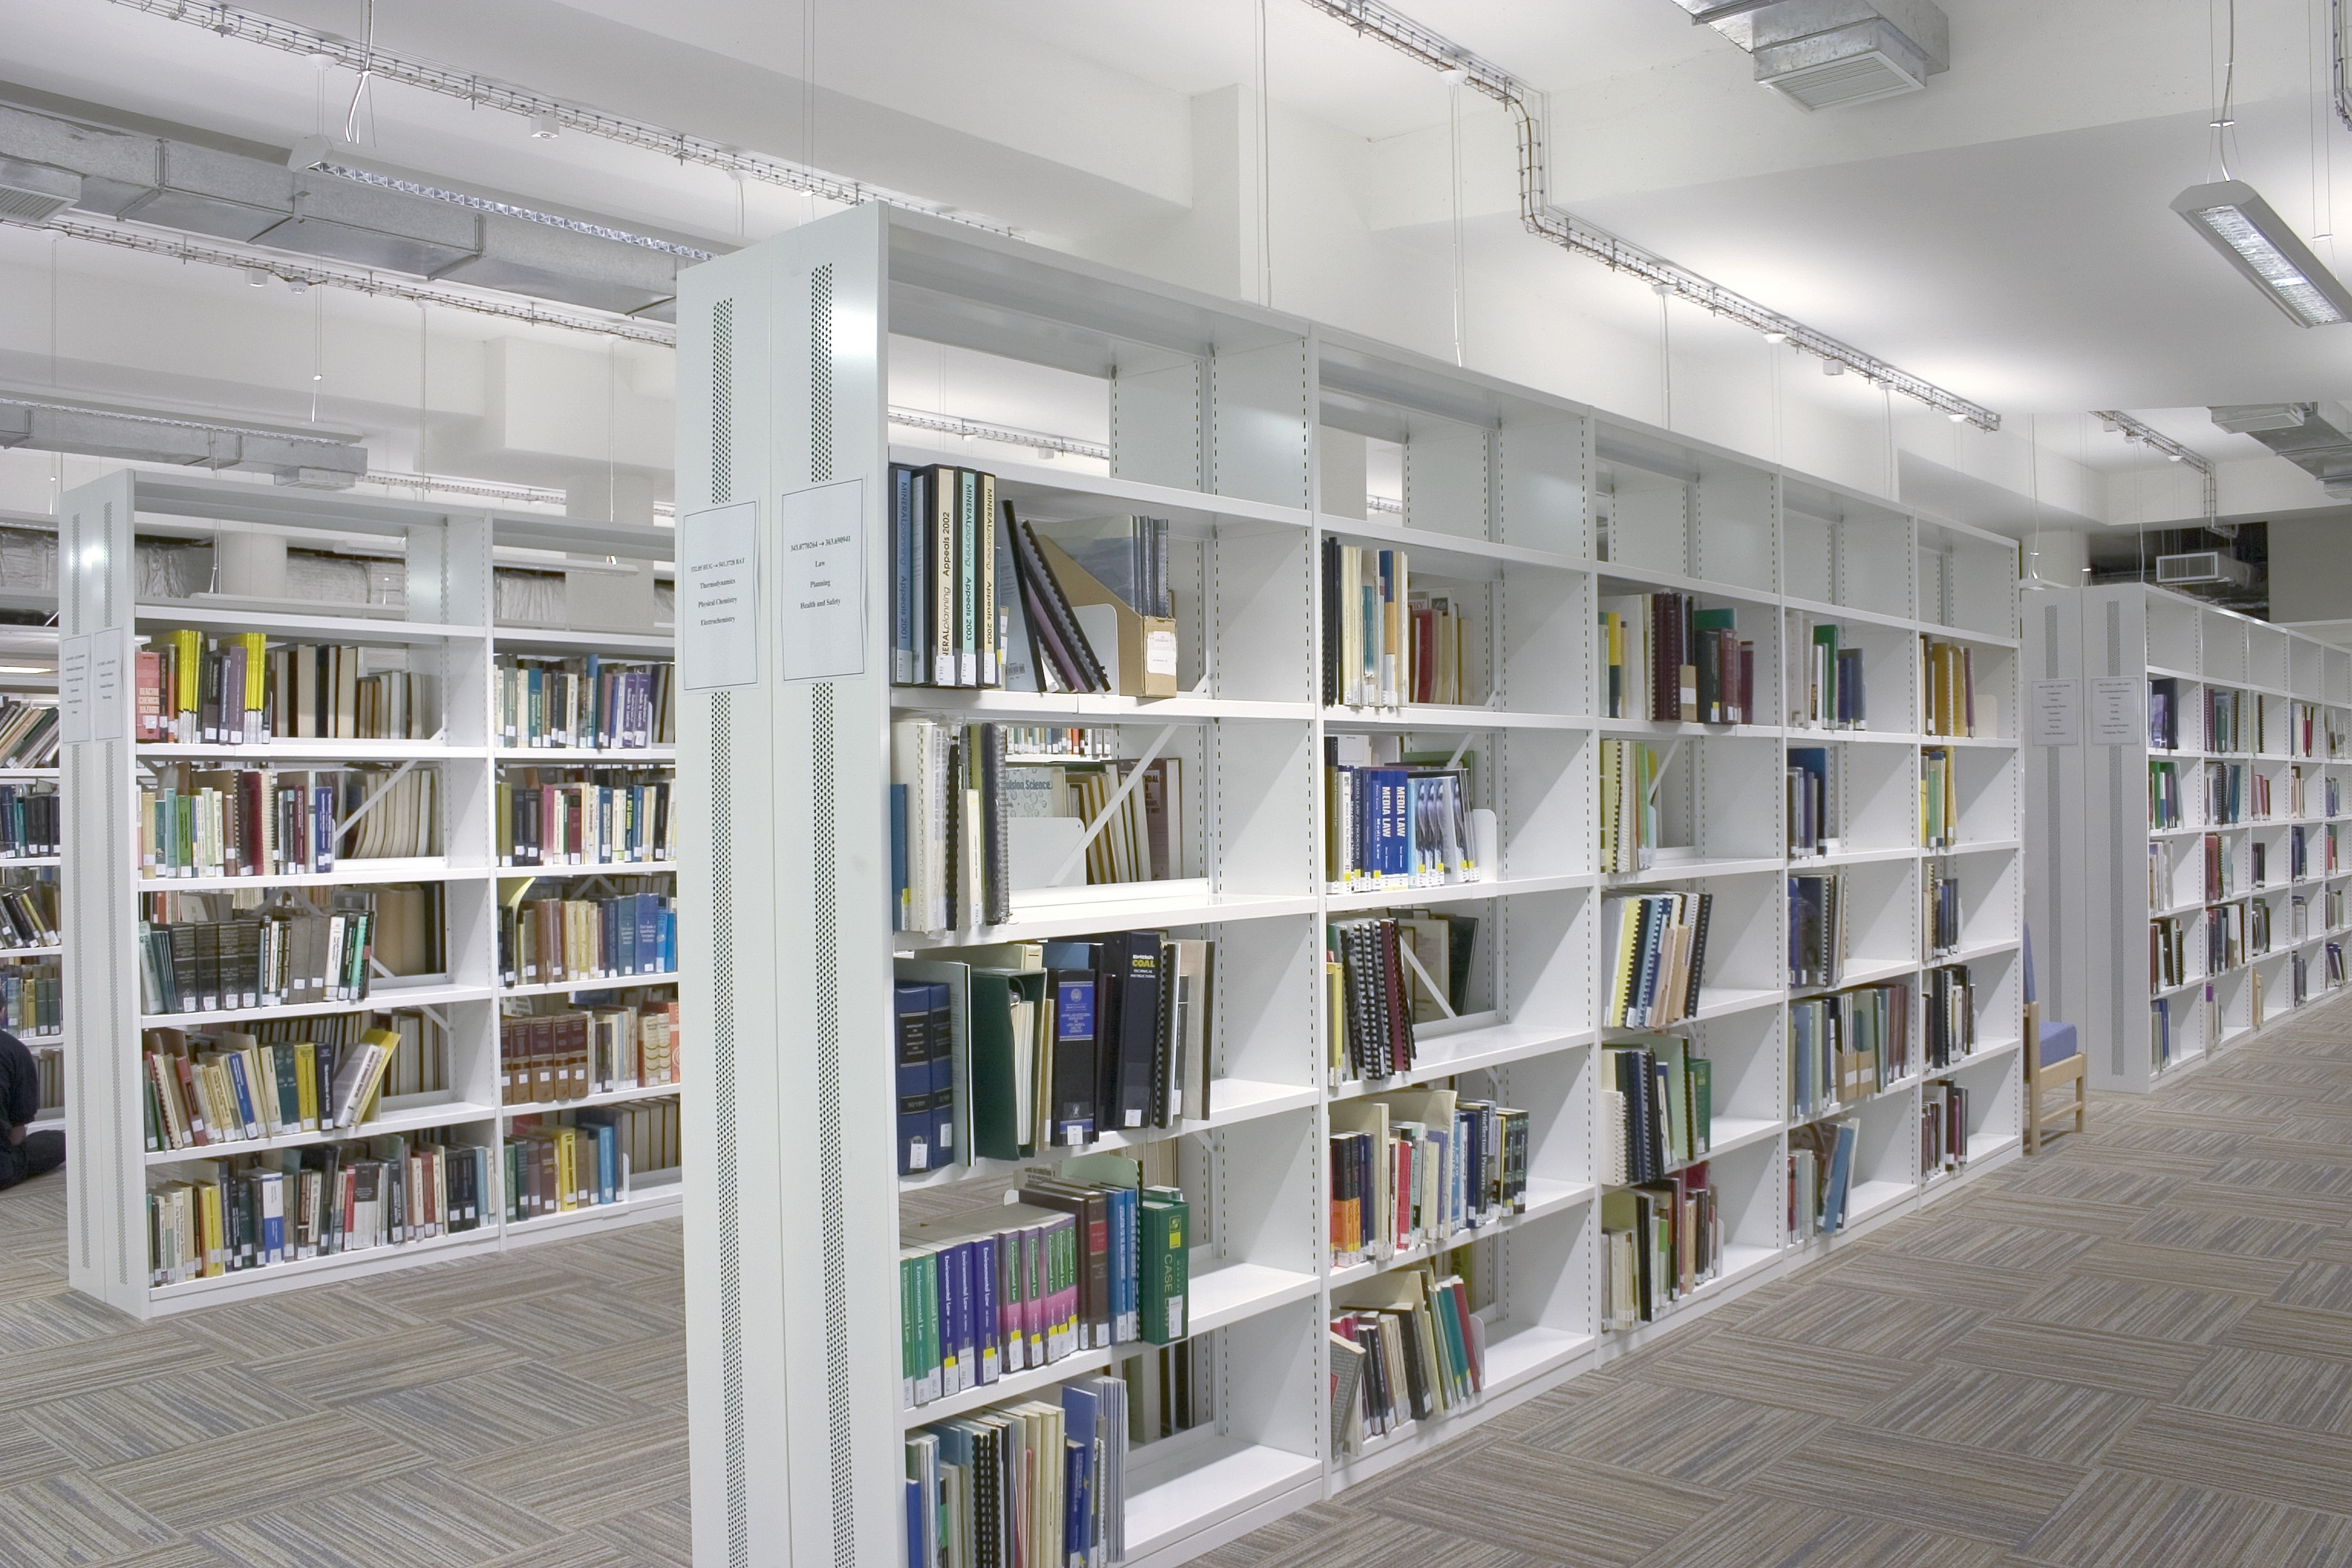 Library Shelving Storage Stacks